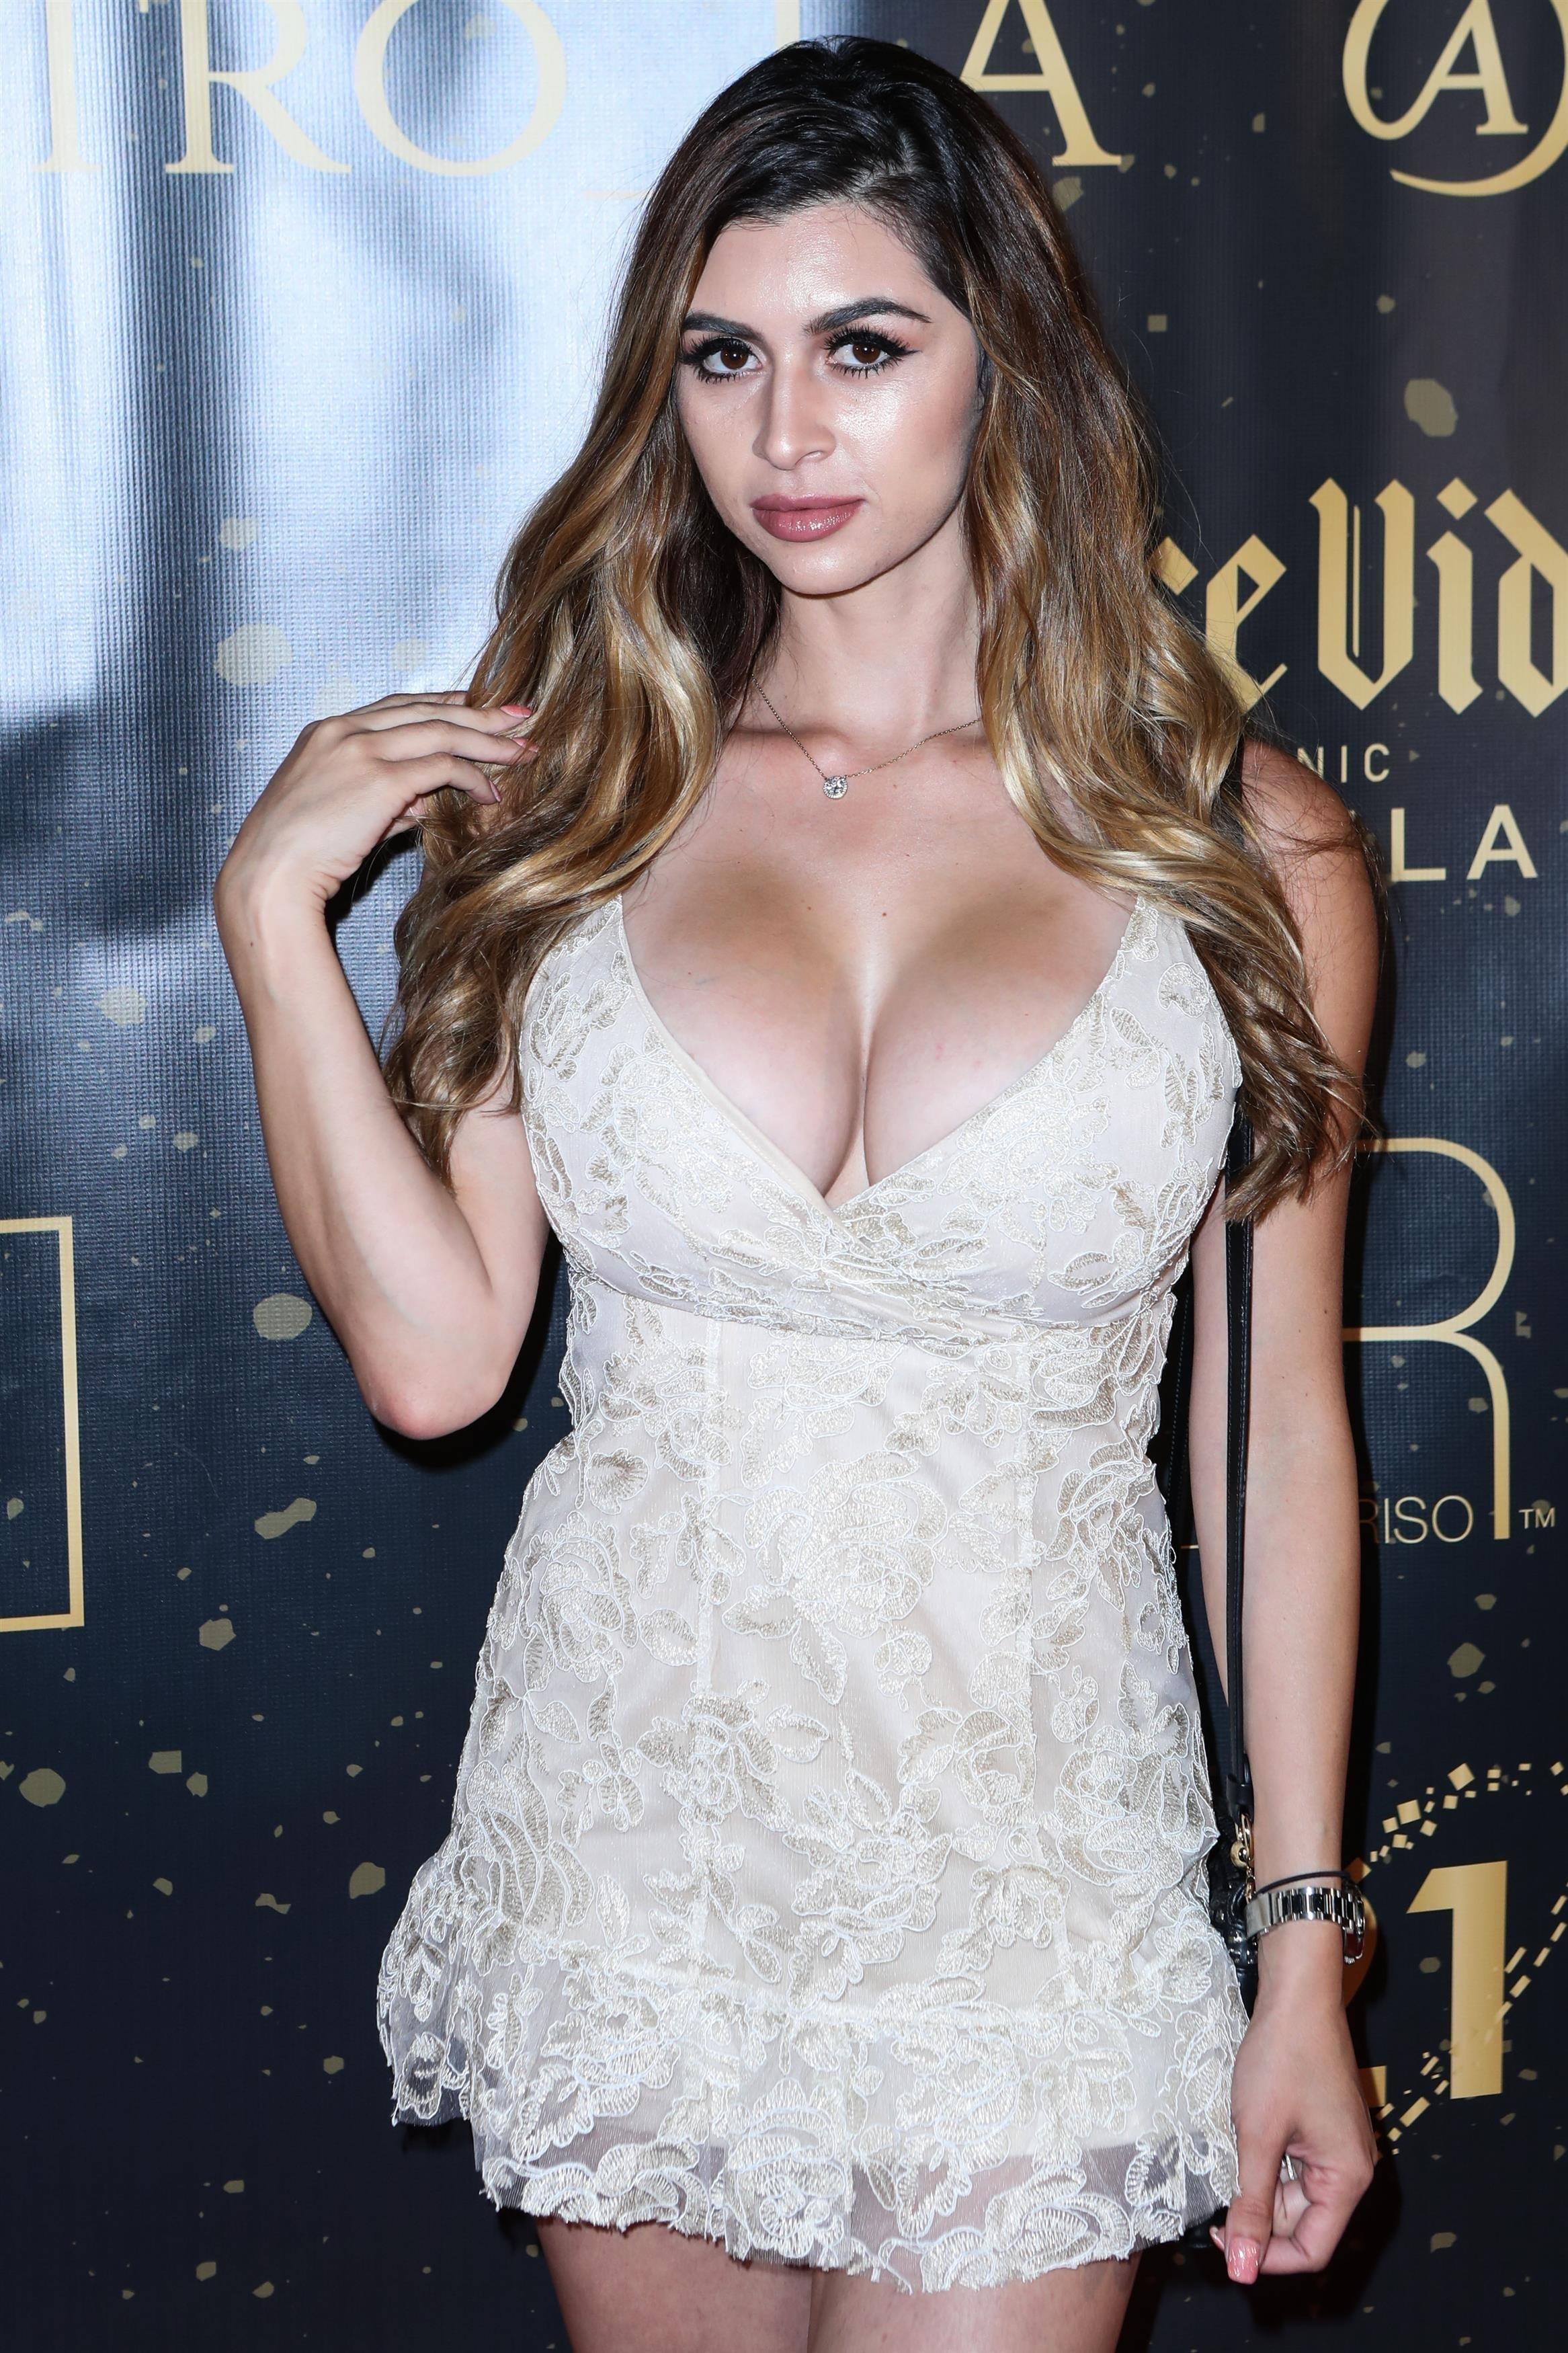 Brittney Ana